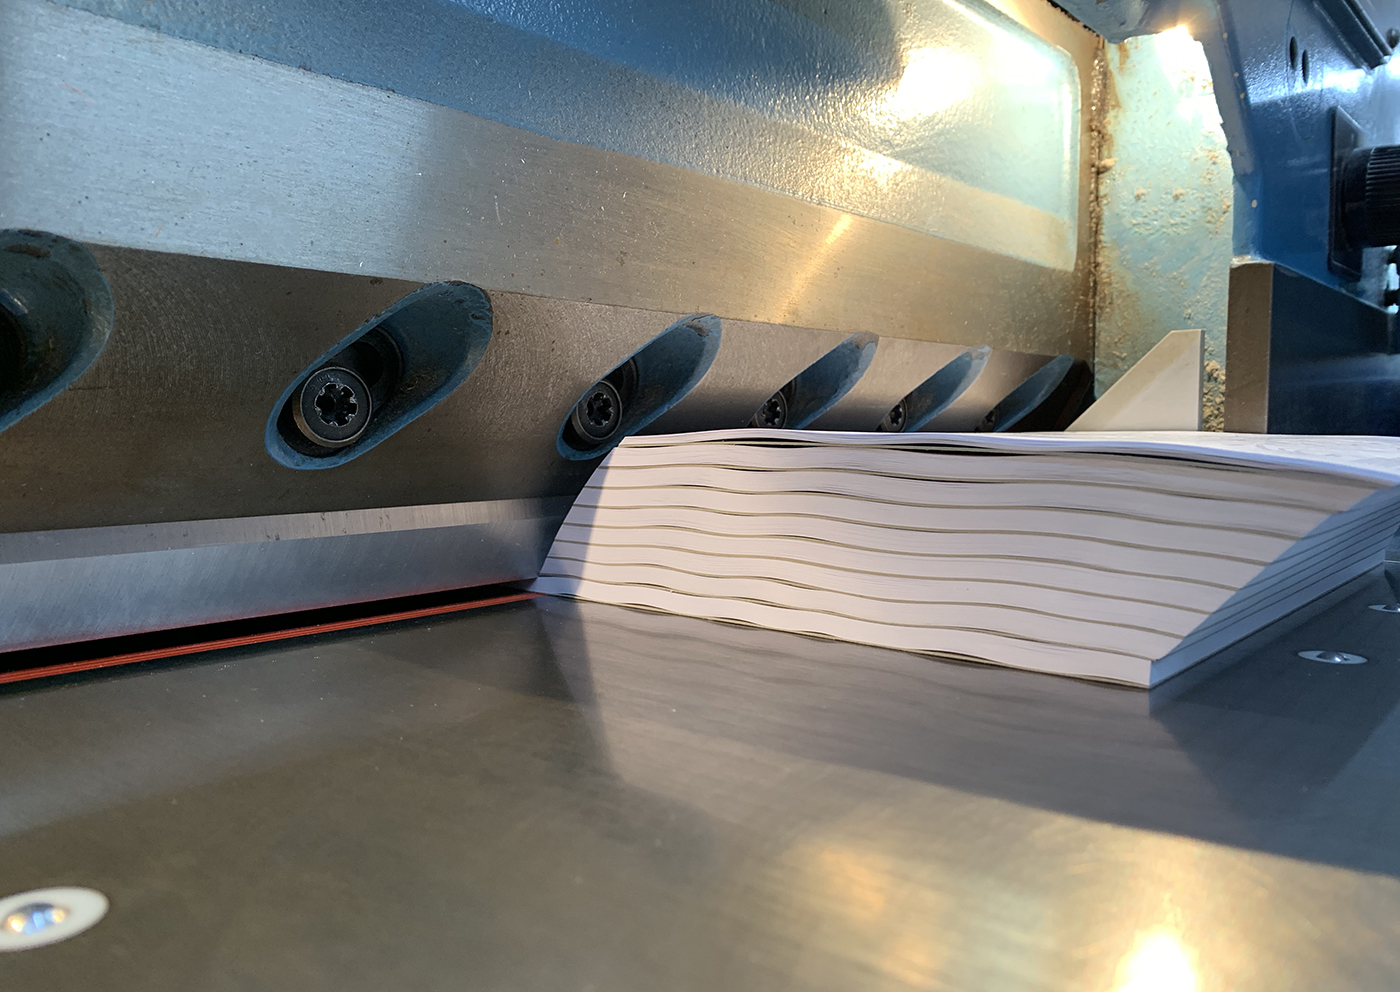 Axminster Printing Guilotine